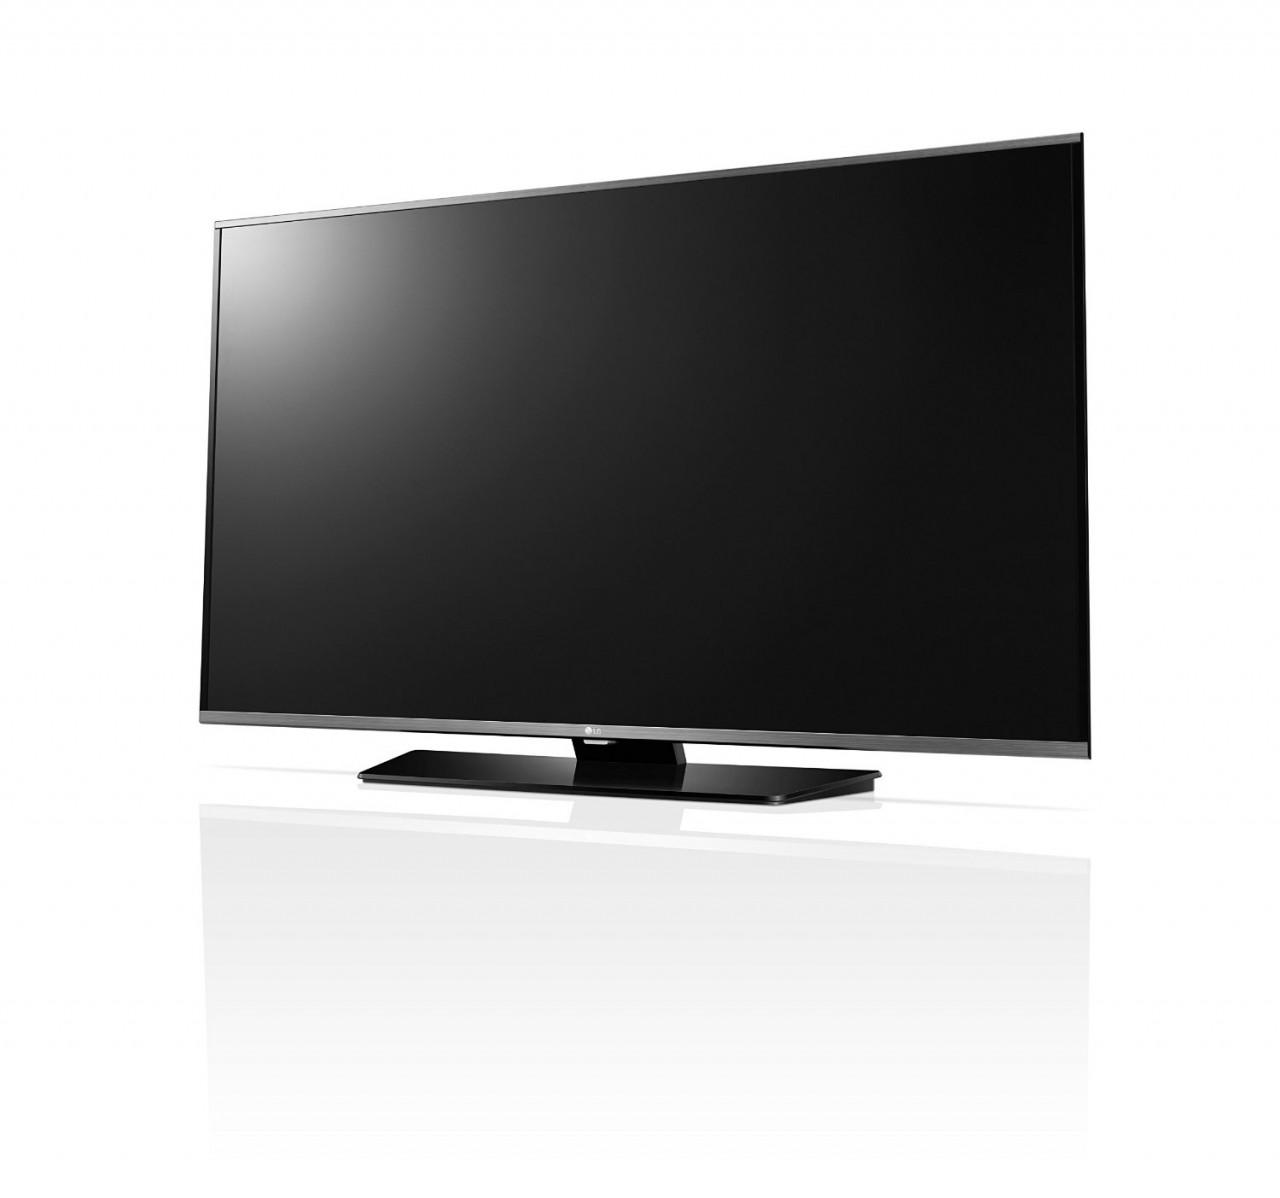 lg 55 55lf6300 smart full led tv price in pakistan. Black Bedroom Furniture Sets. Home Design Ideas